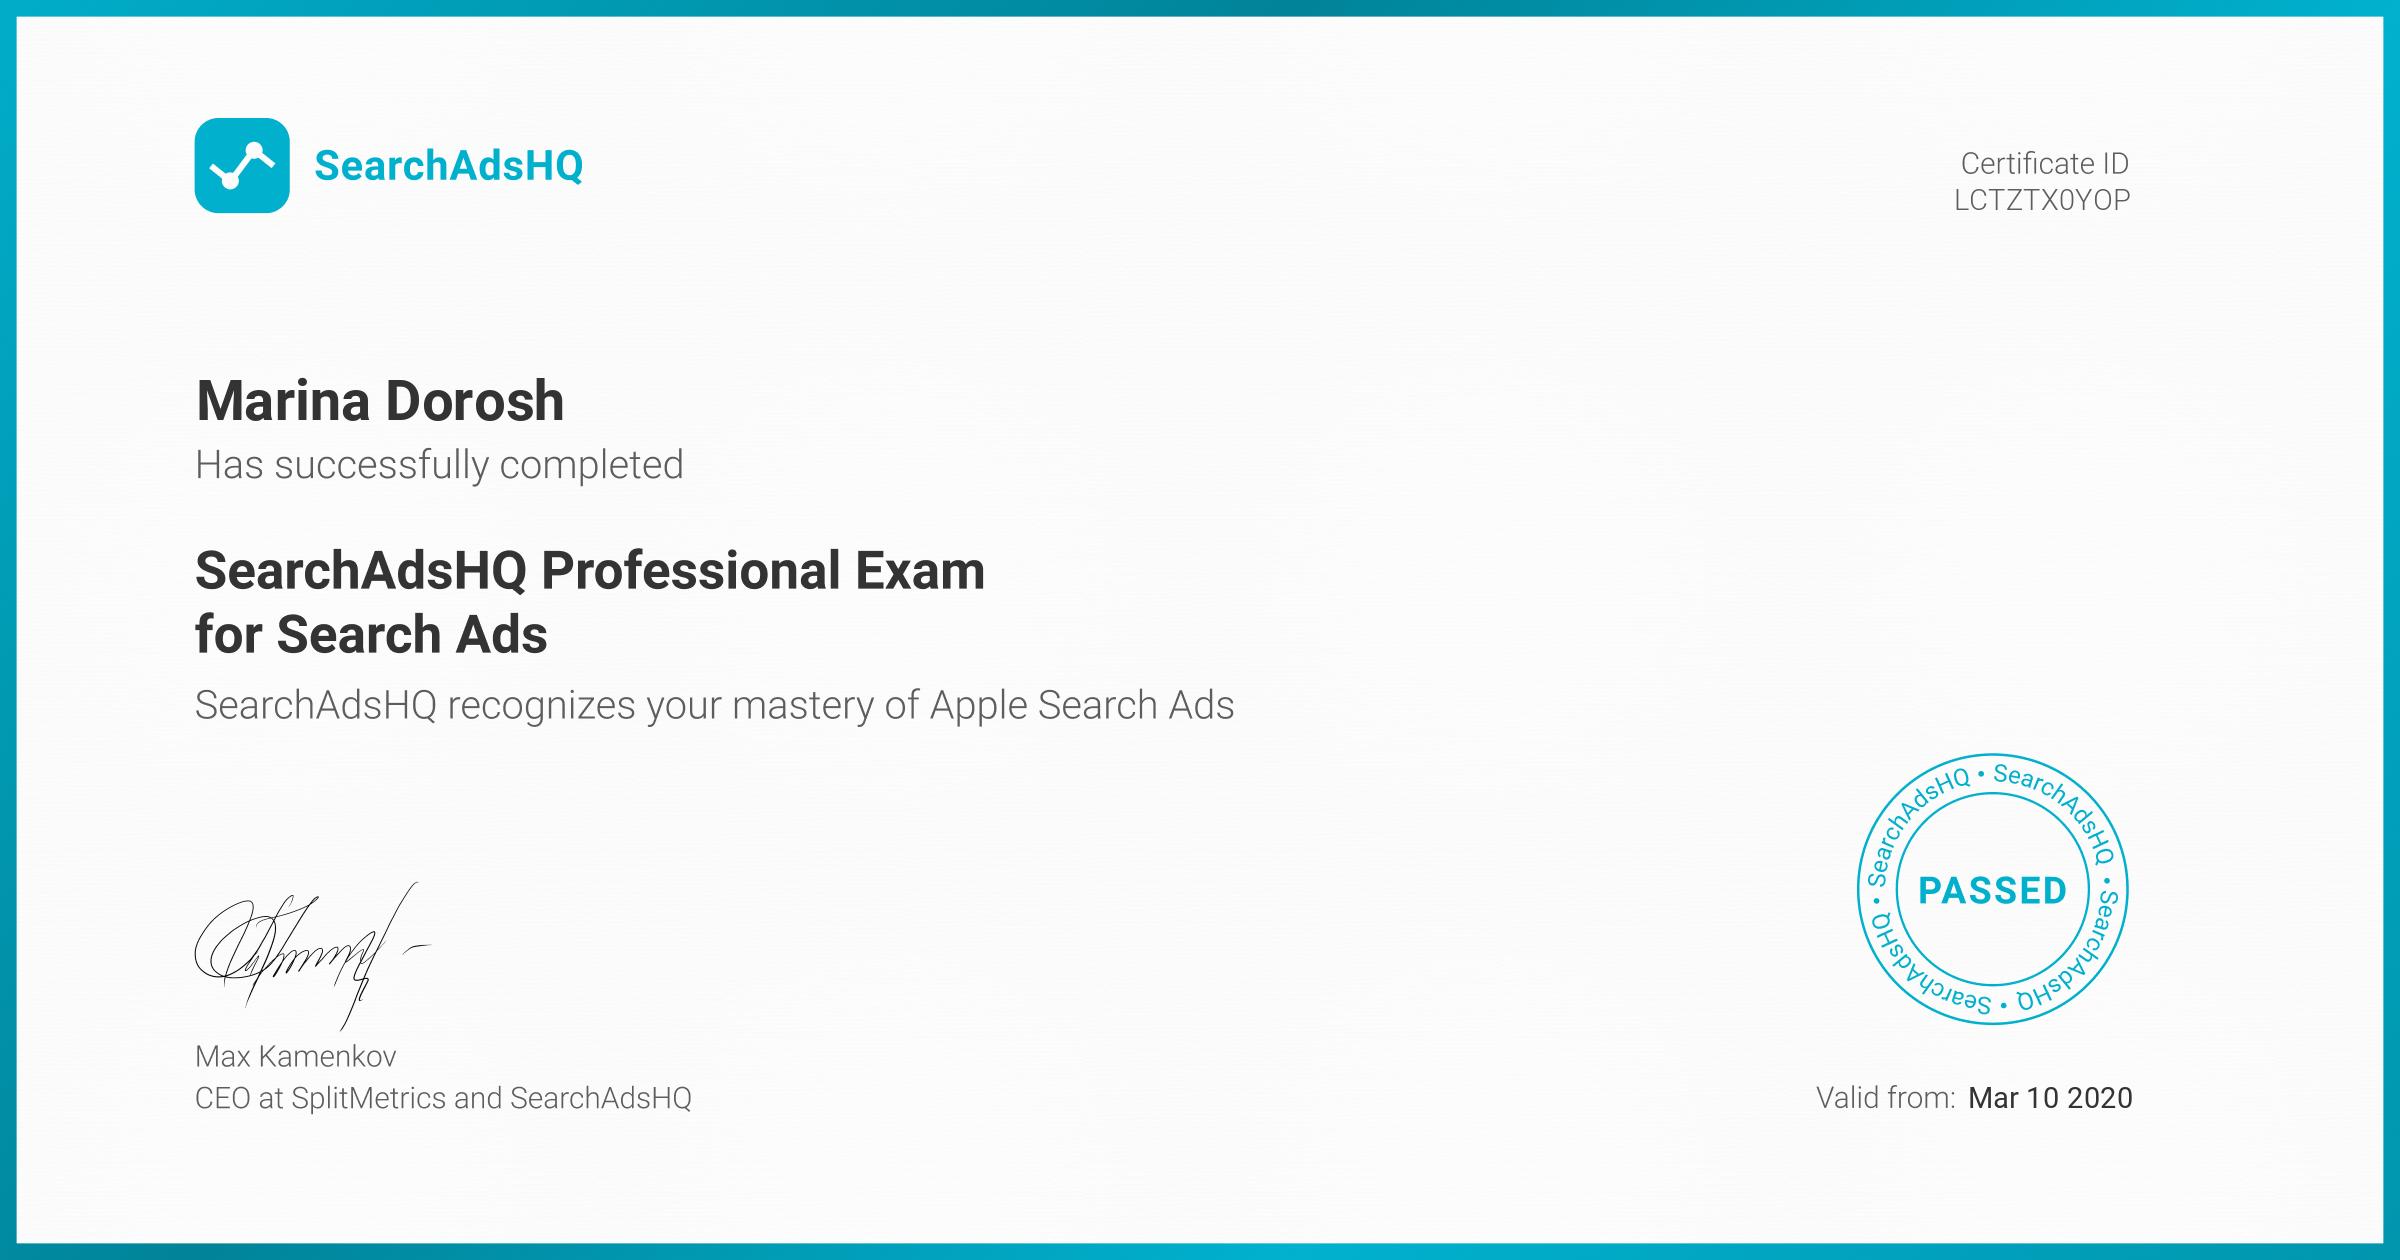 Certificate for Marina Dorosh | SearchAdsHQ Professional Exam for Search Ads